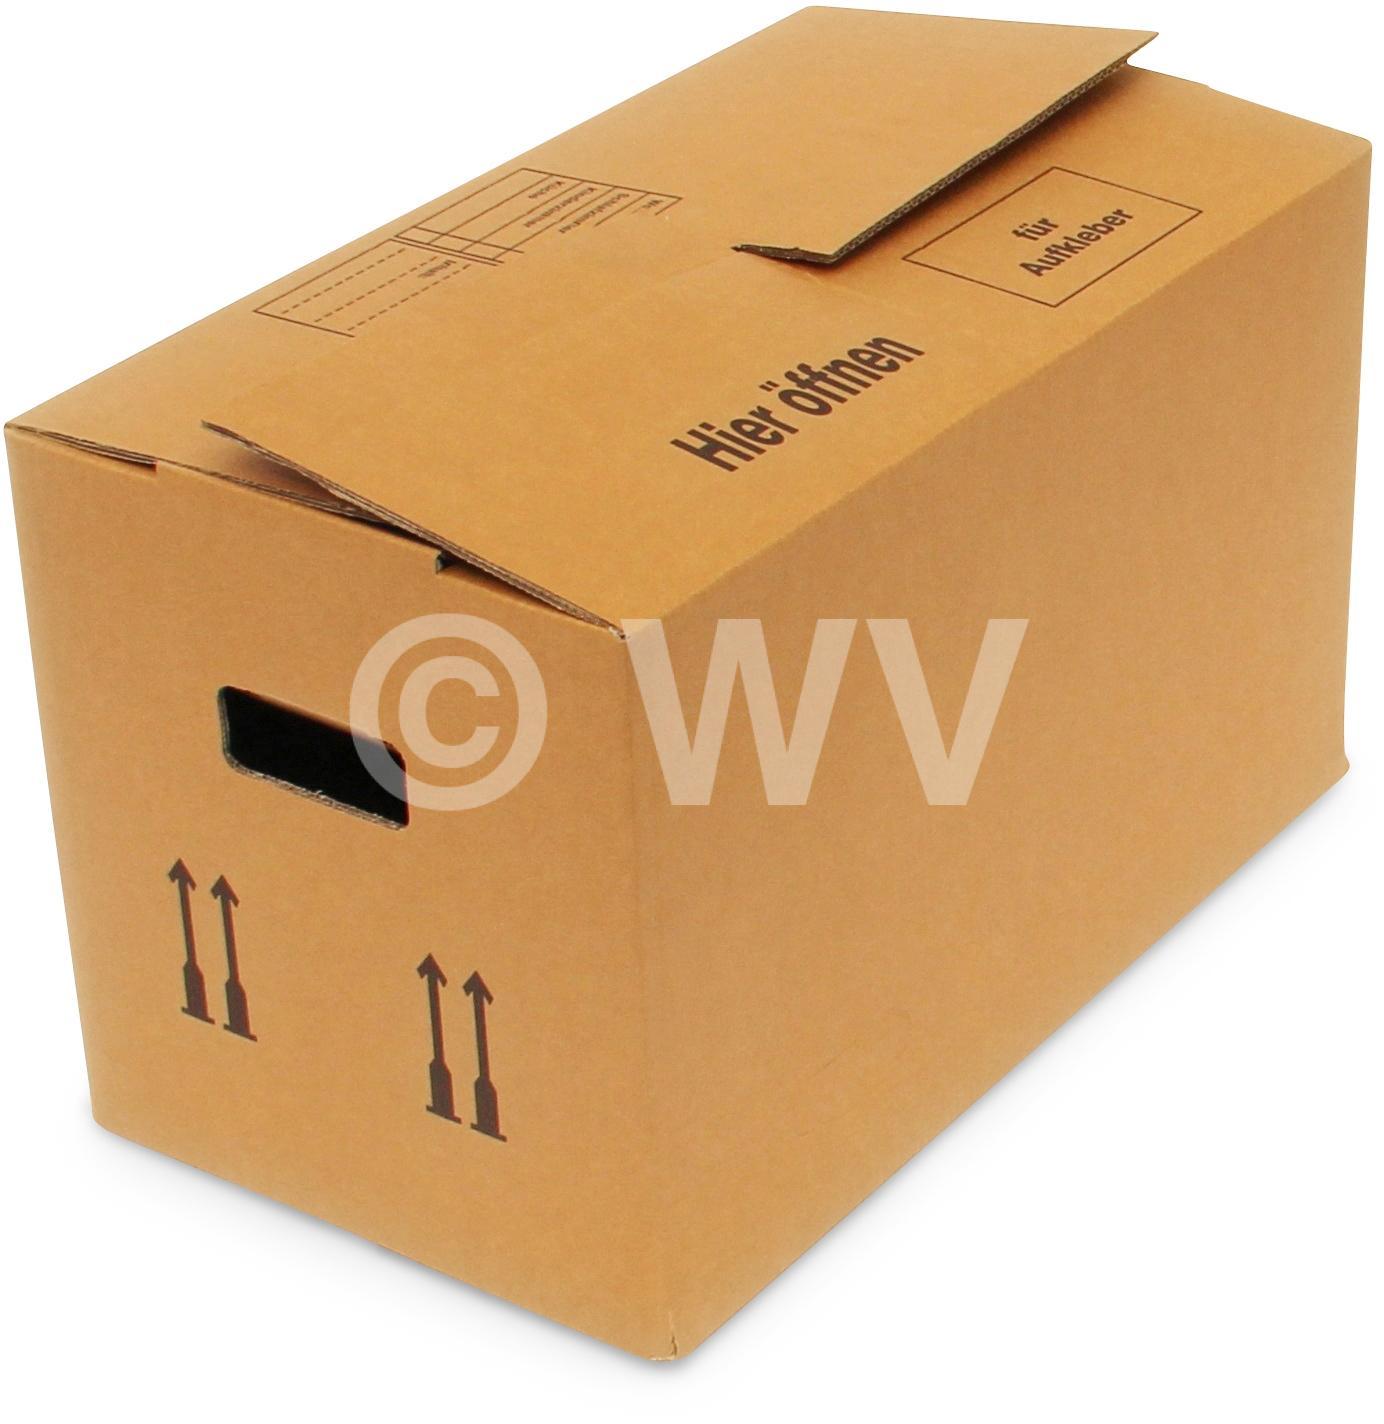 25er Pack Wellpappenschachtel FEFCO 0427-190x120x30 mm Versandkarton//Maxibrief